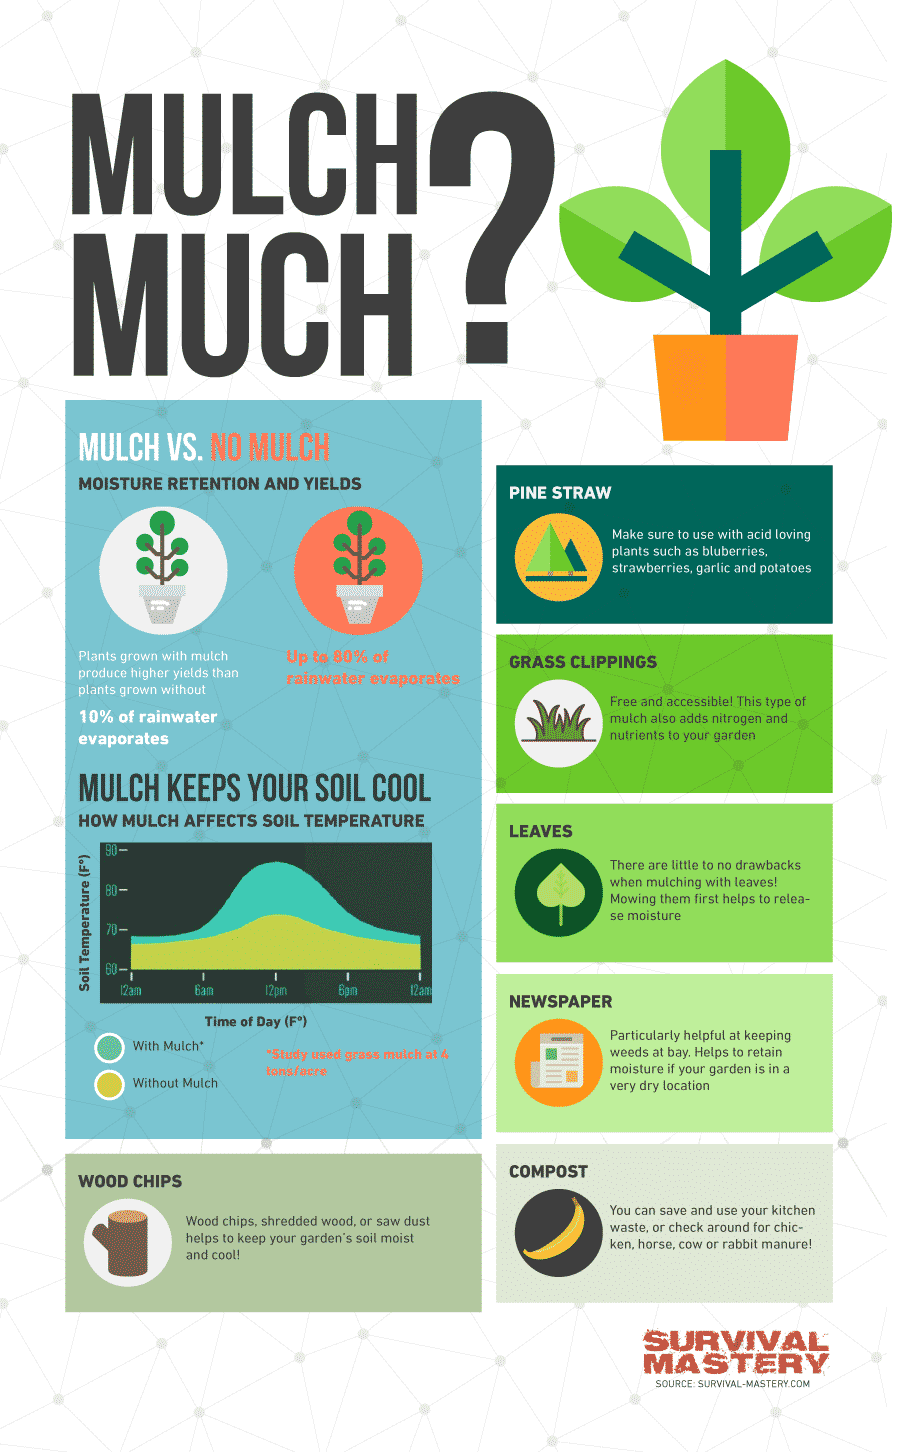 Mulch much infographic